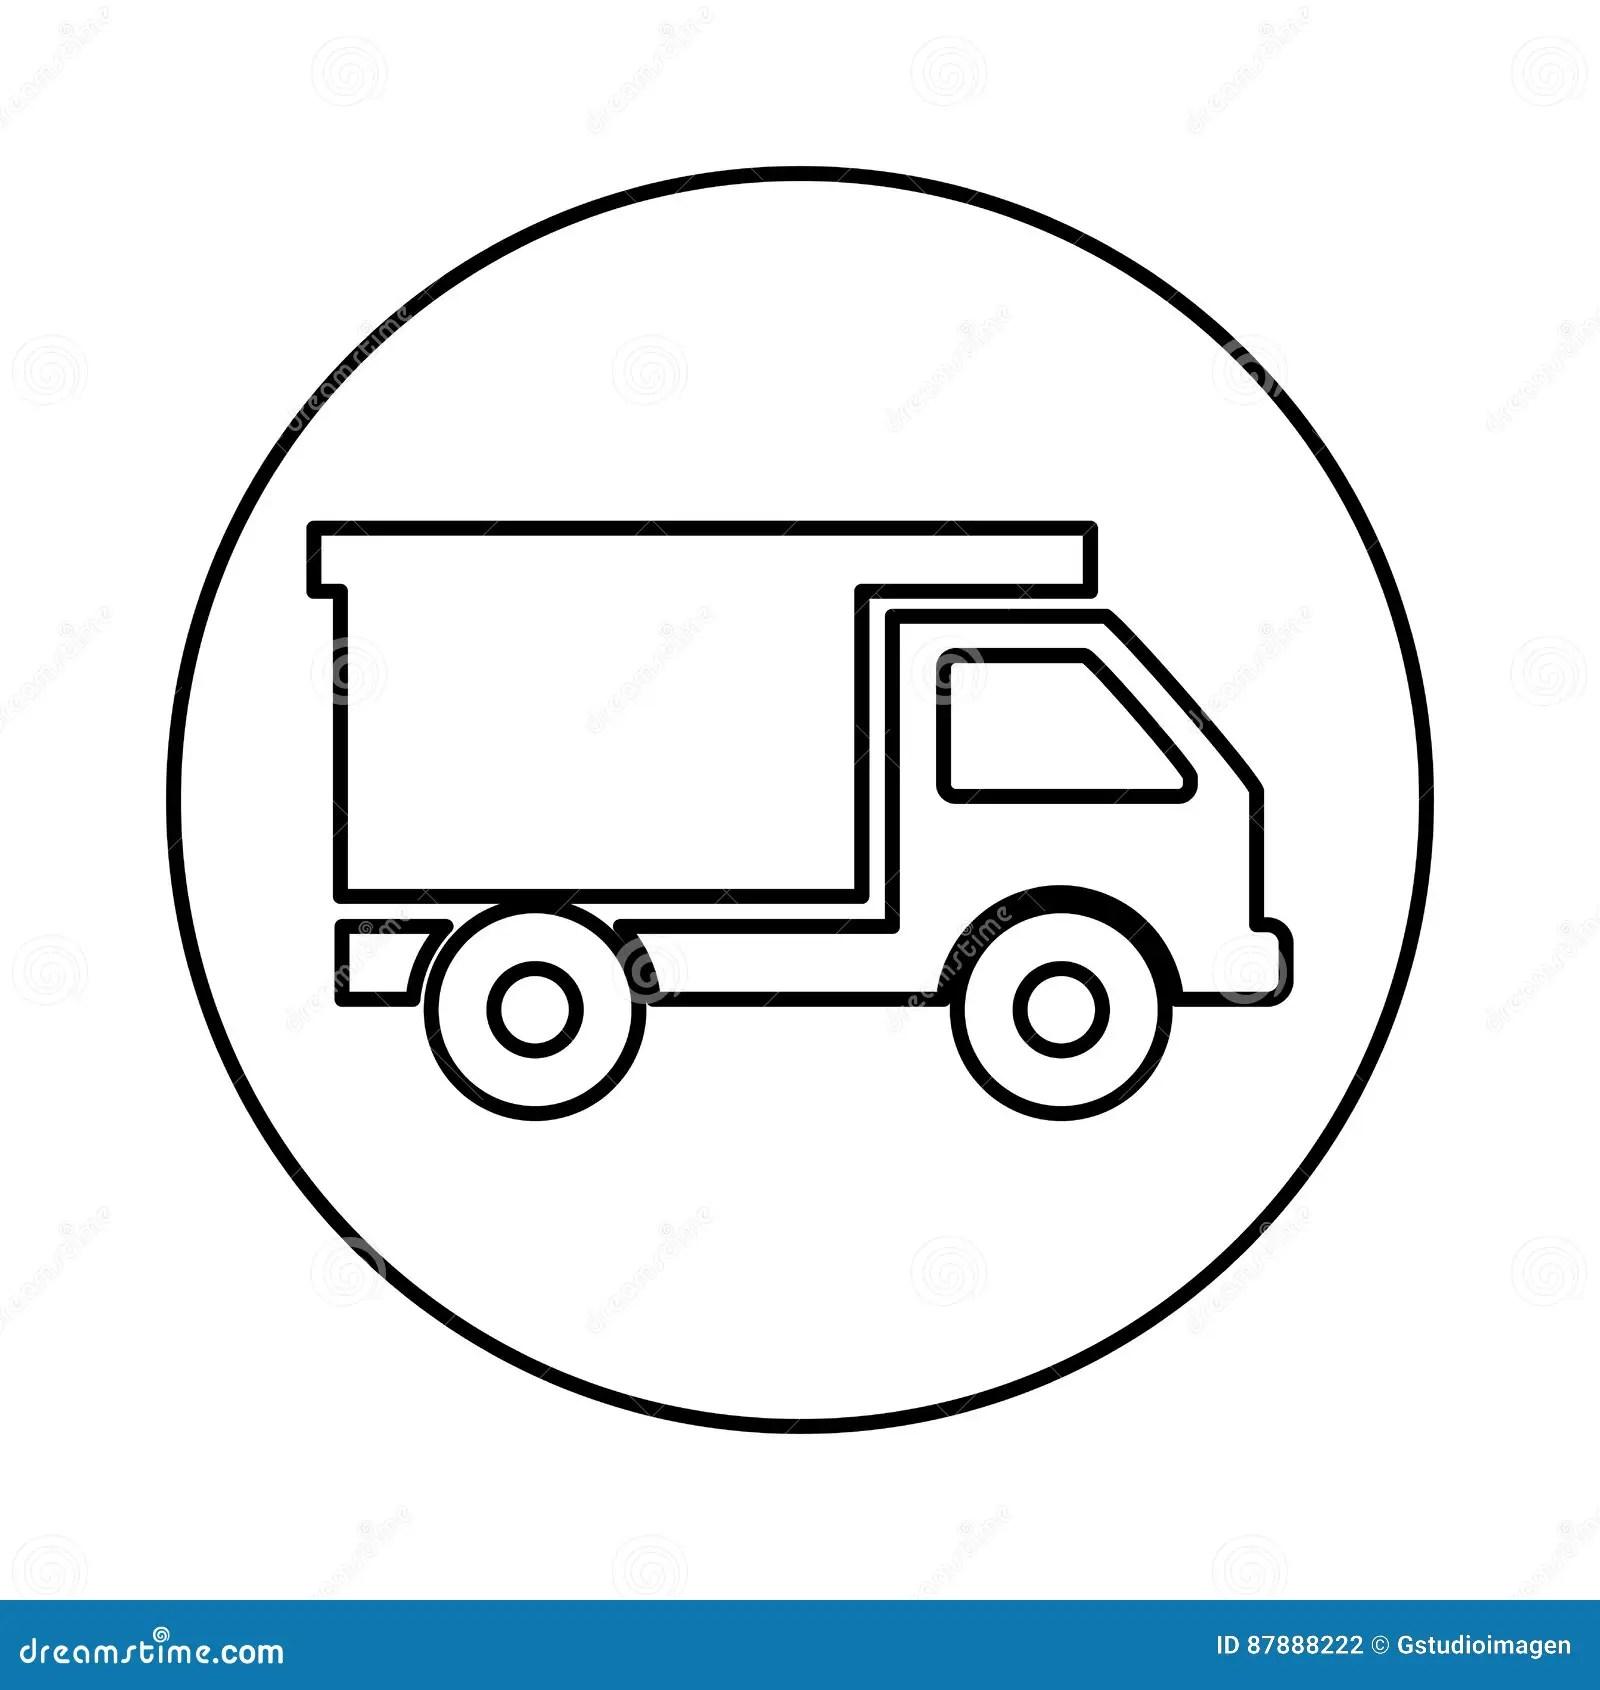 Dump Truck Isolated Icon Stock Vector Illustration Of